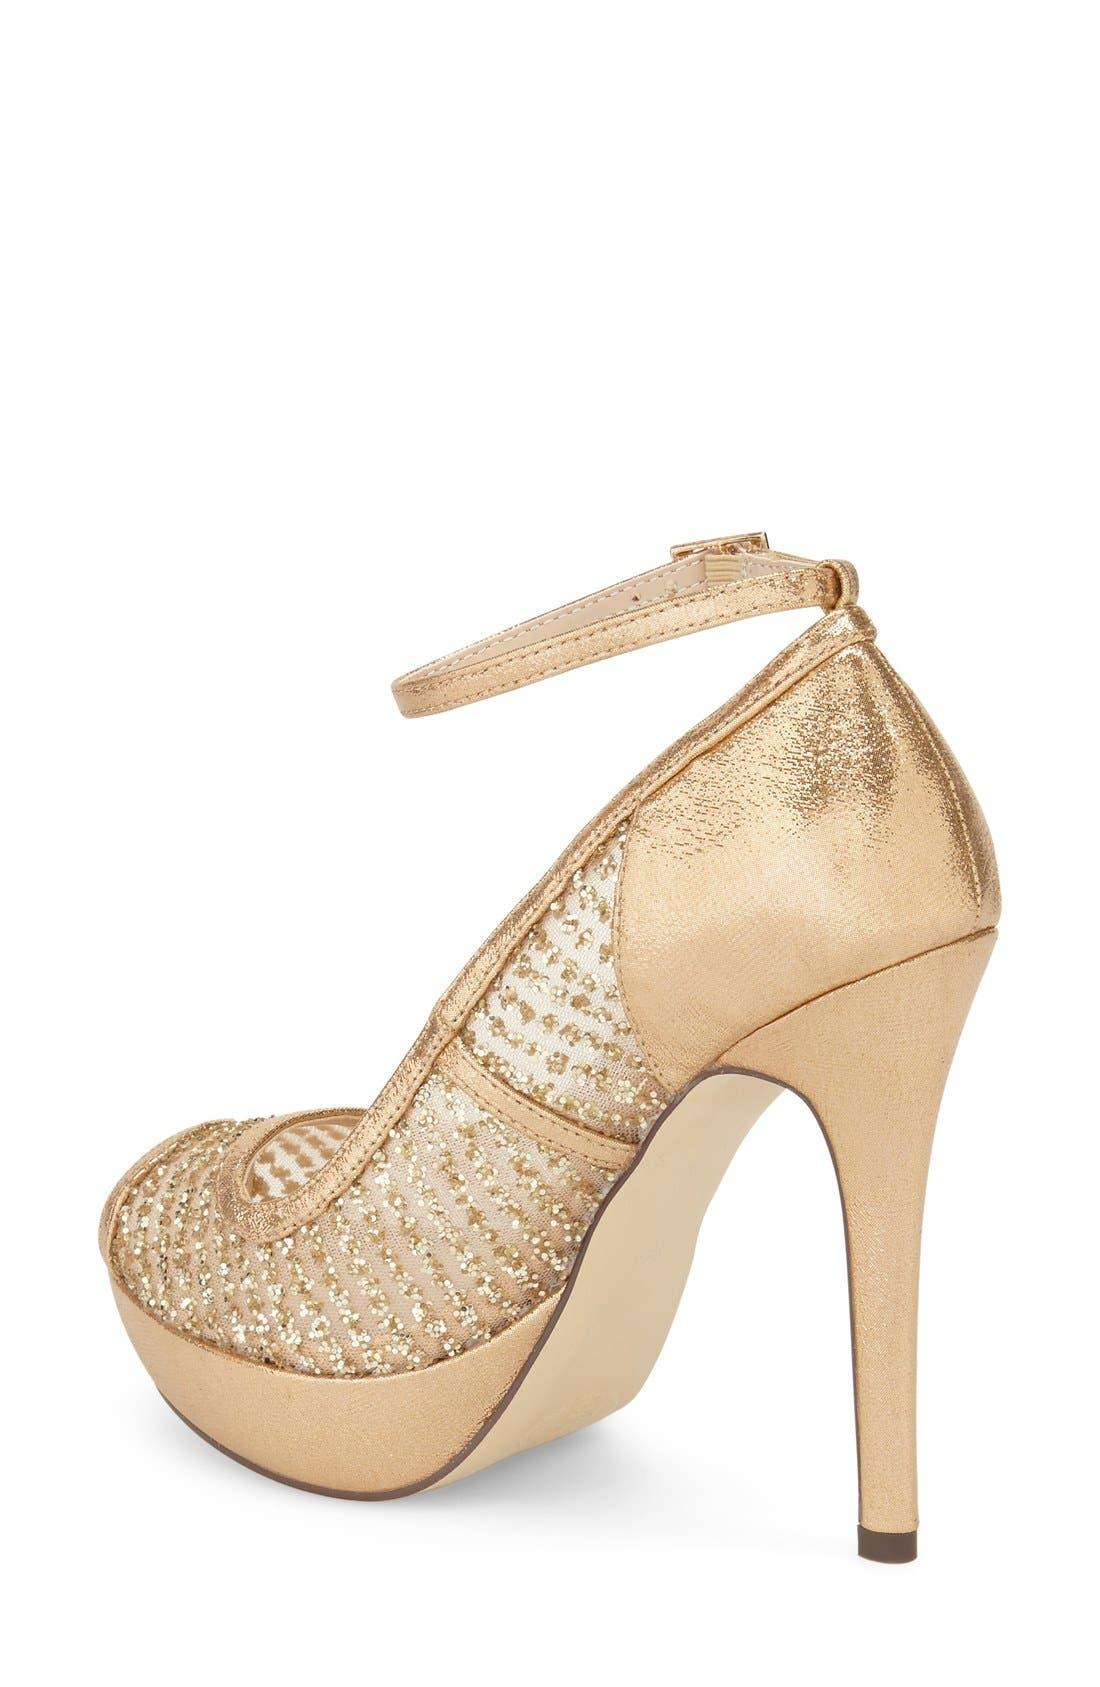 'Tambre' Glitter Platform Sandal,                             Alternate thumbnail 2, color,                             273